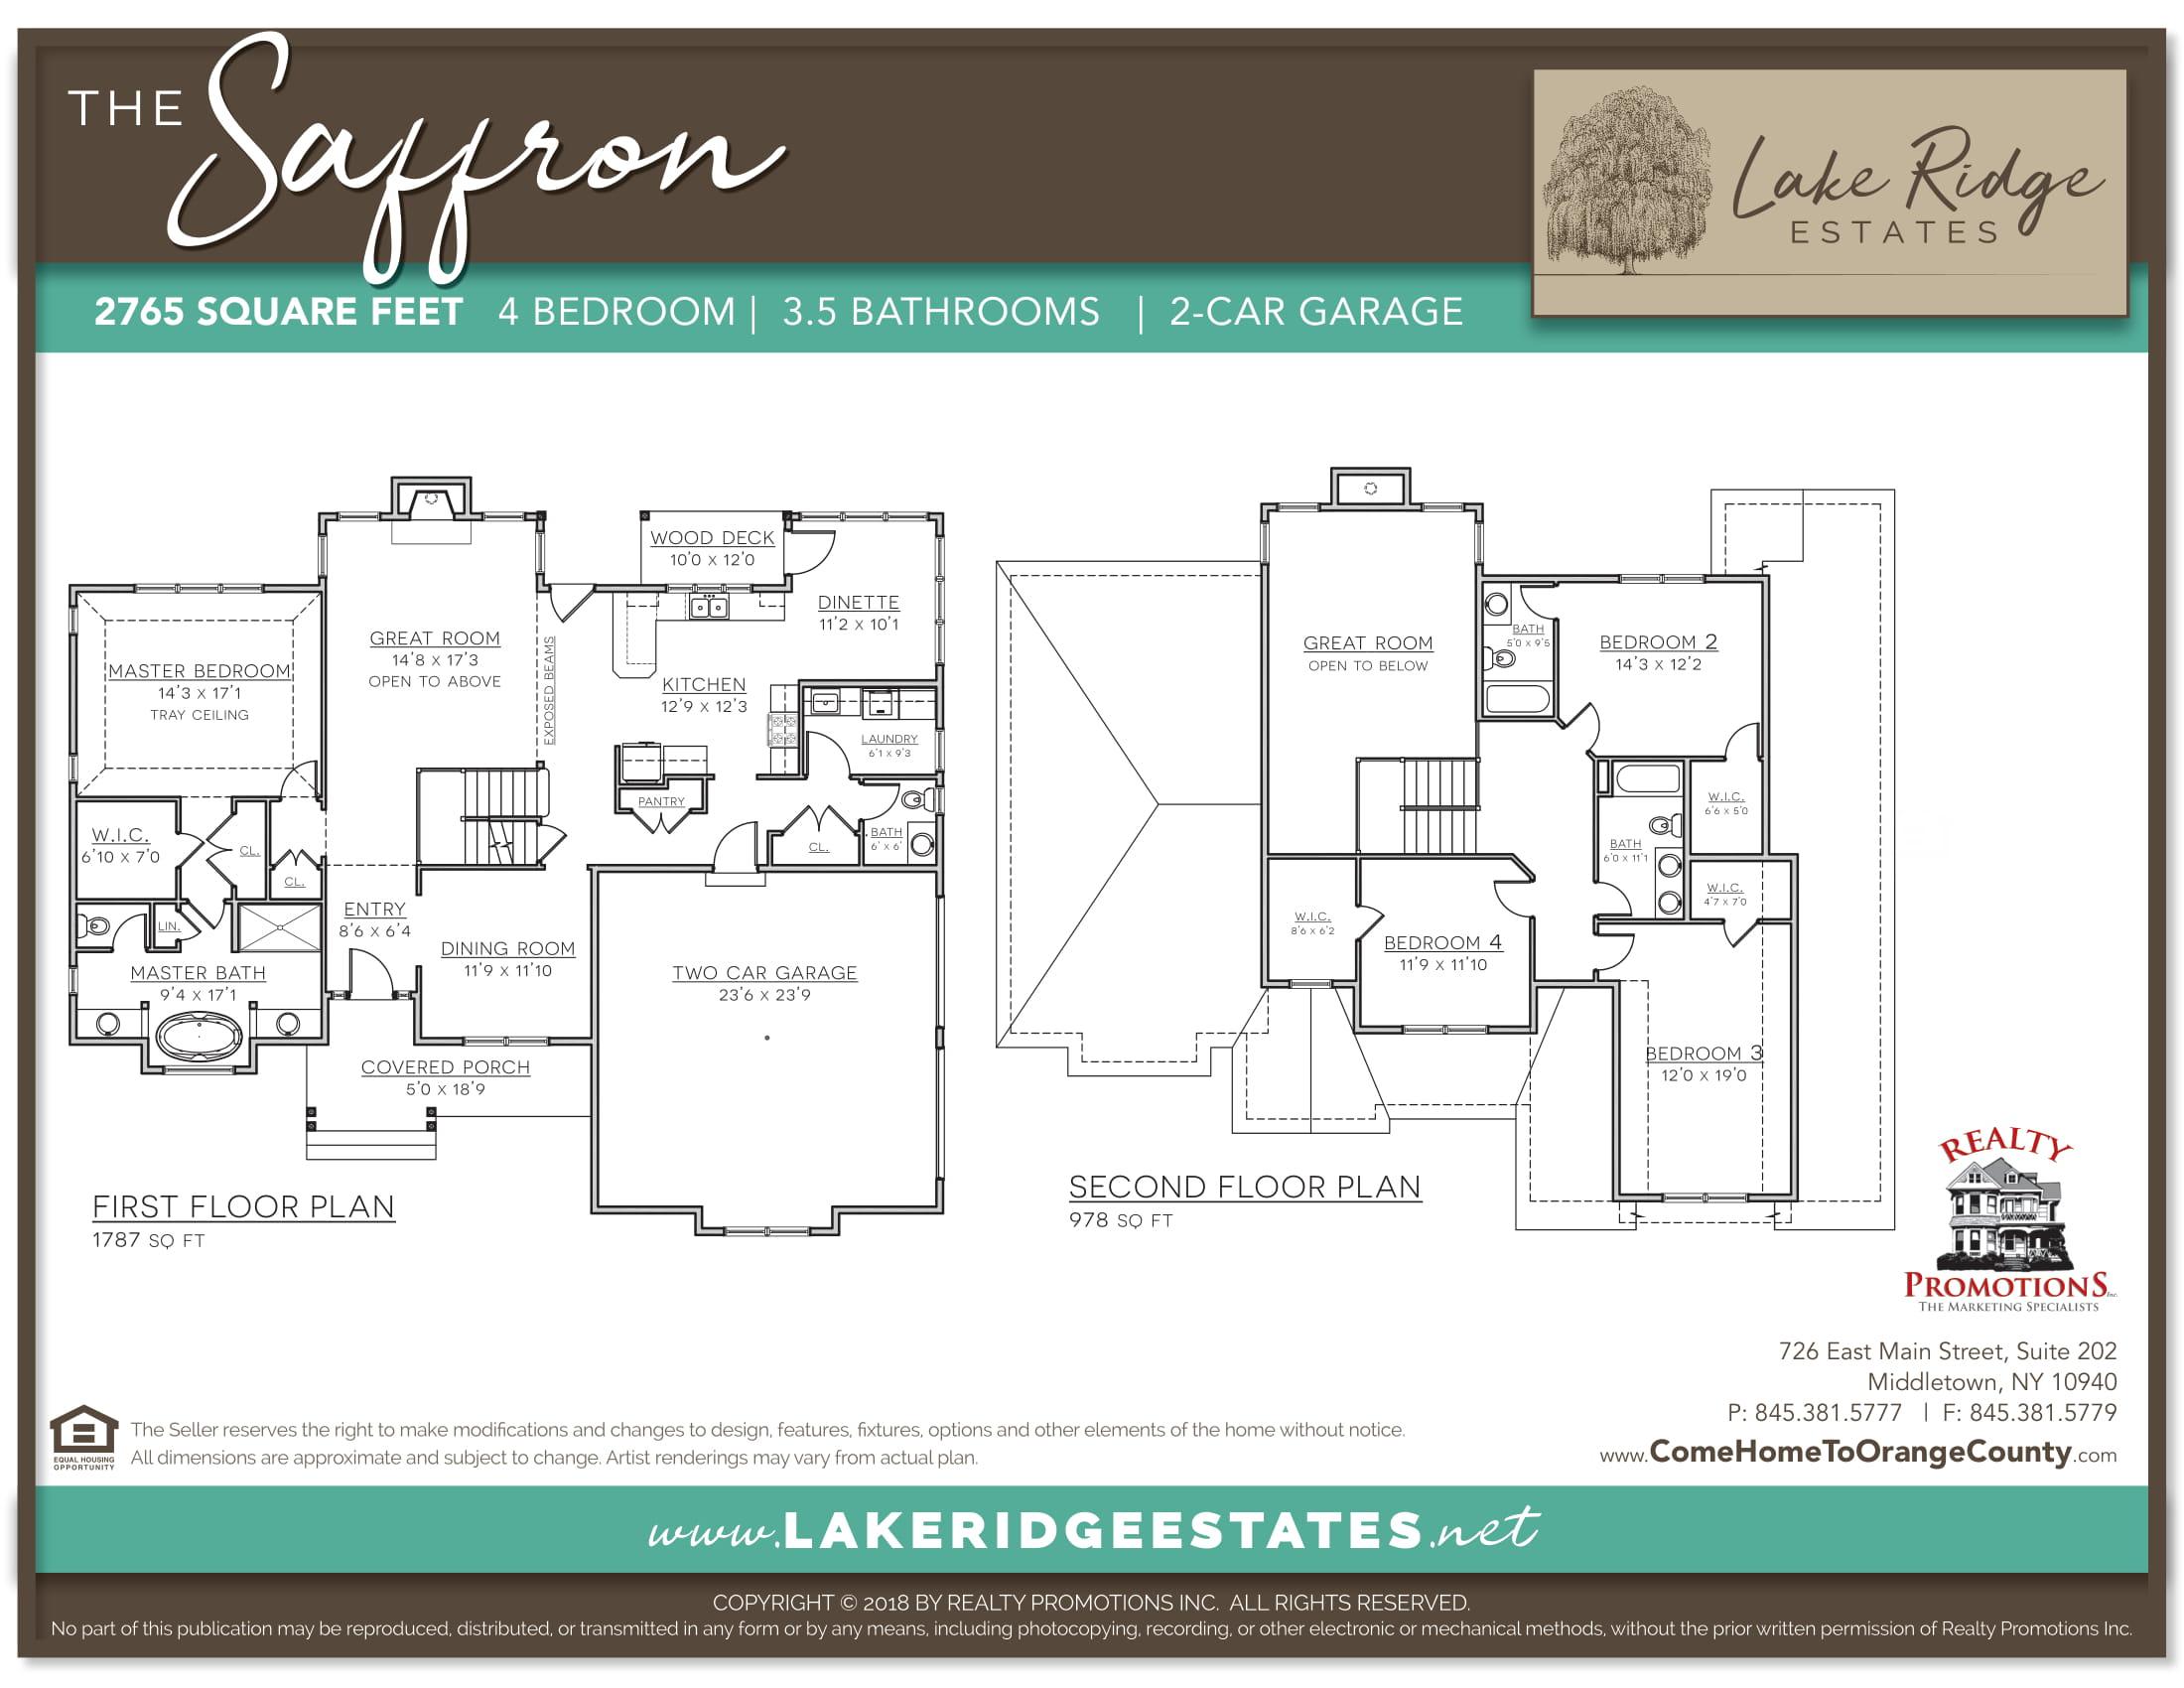 Christopher Ogden Middletown Ny Real Estate Thesaffron Lakeridge 1 2